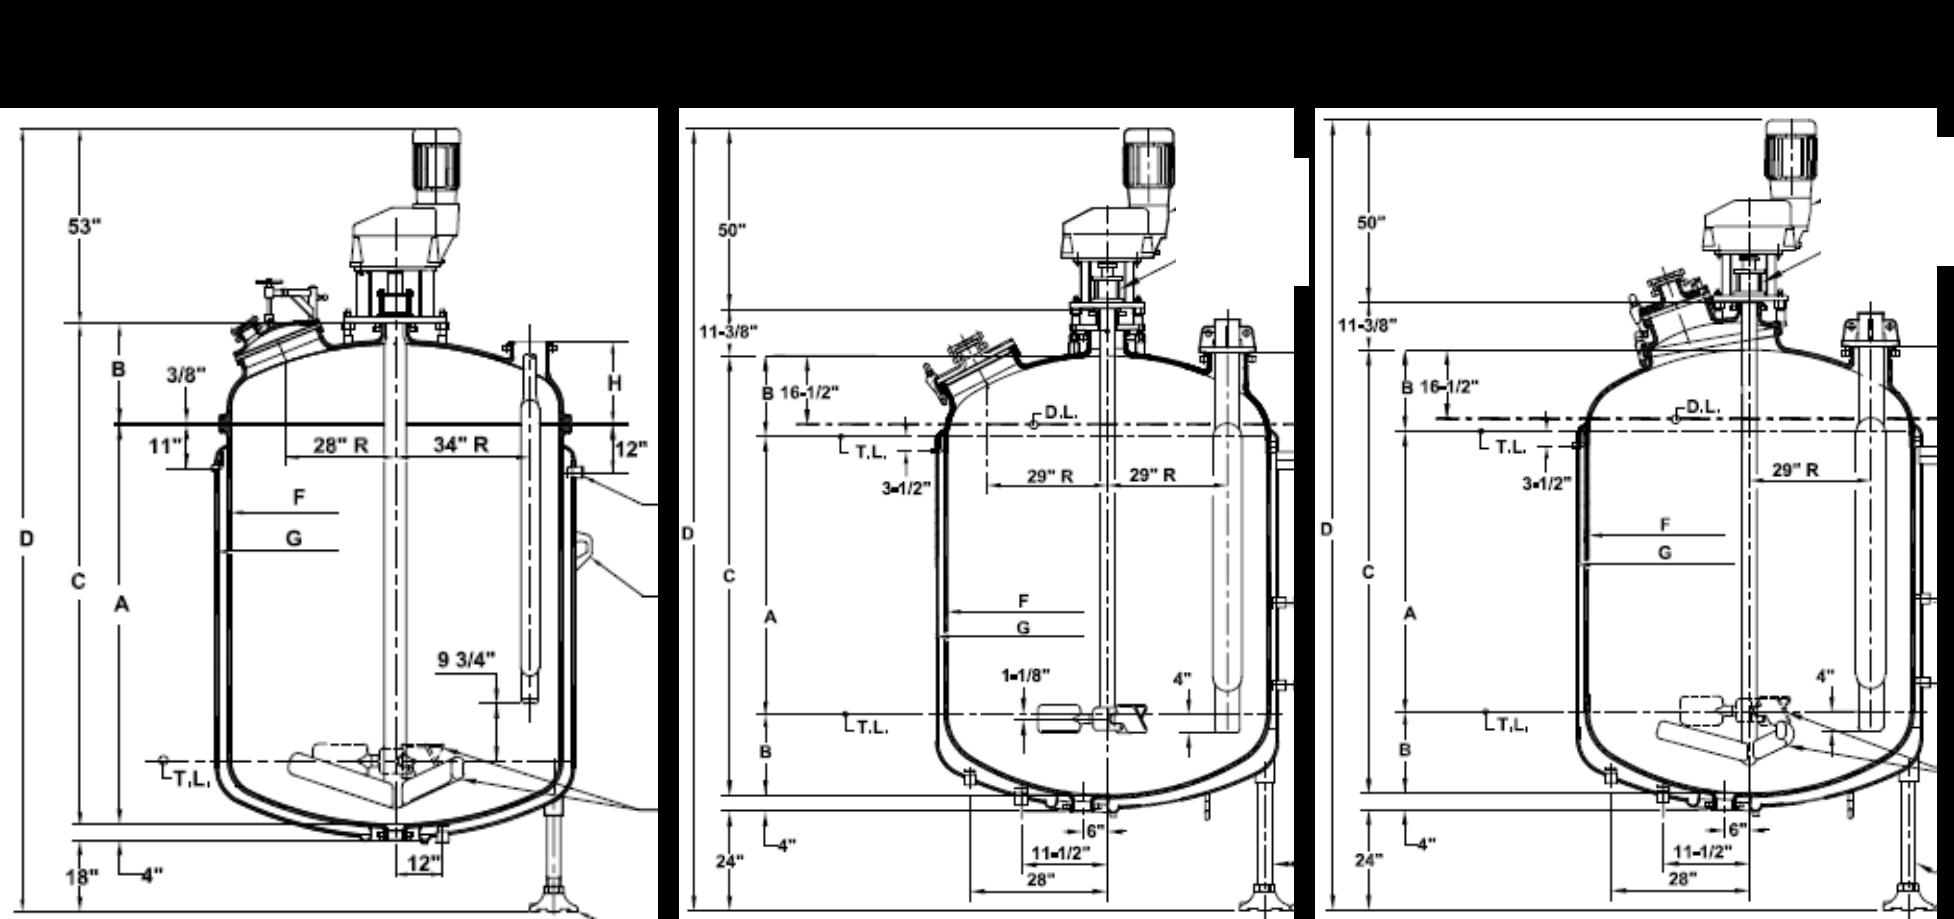 Glass-Lined Reactor Model Comparison